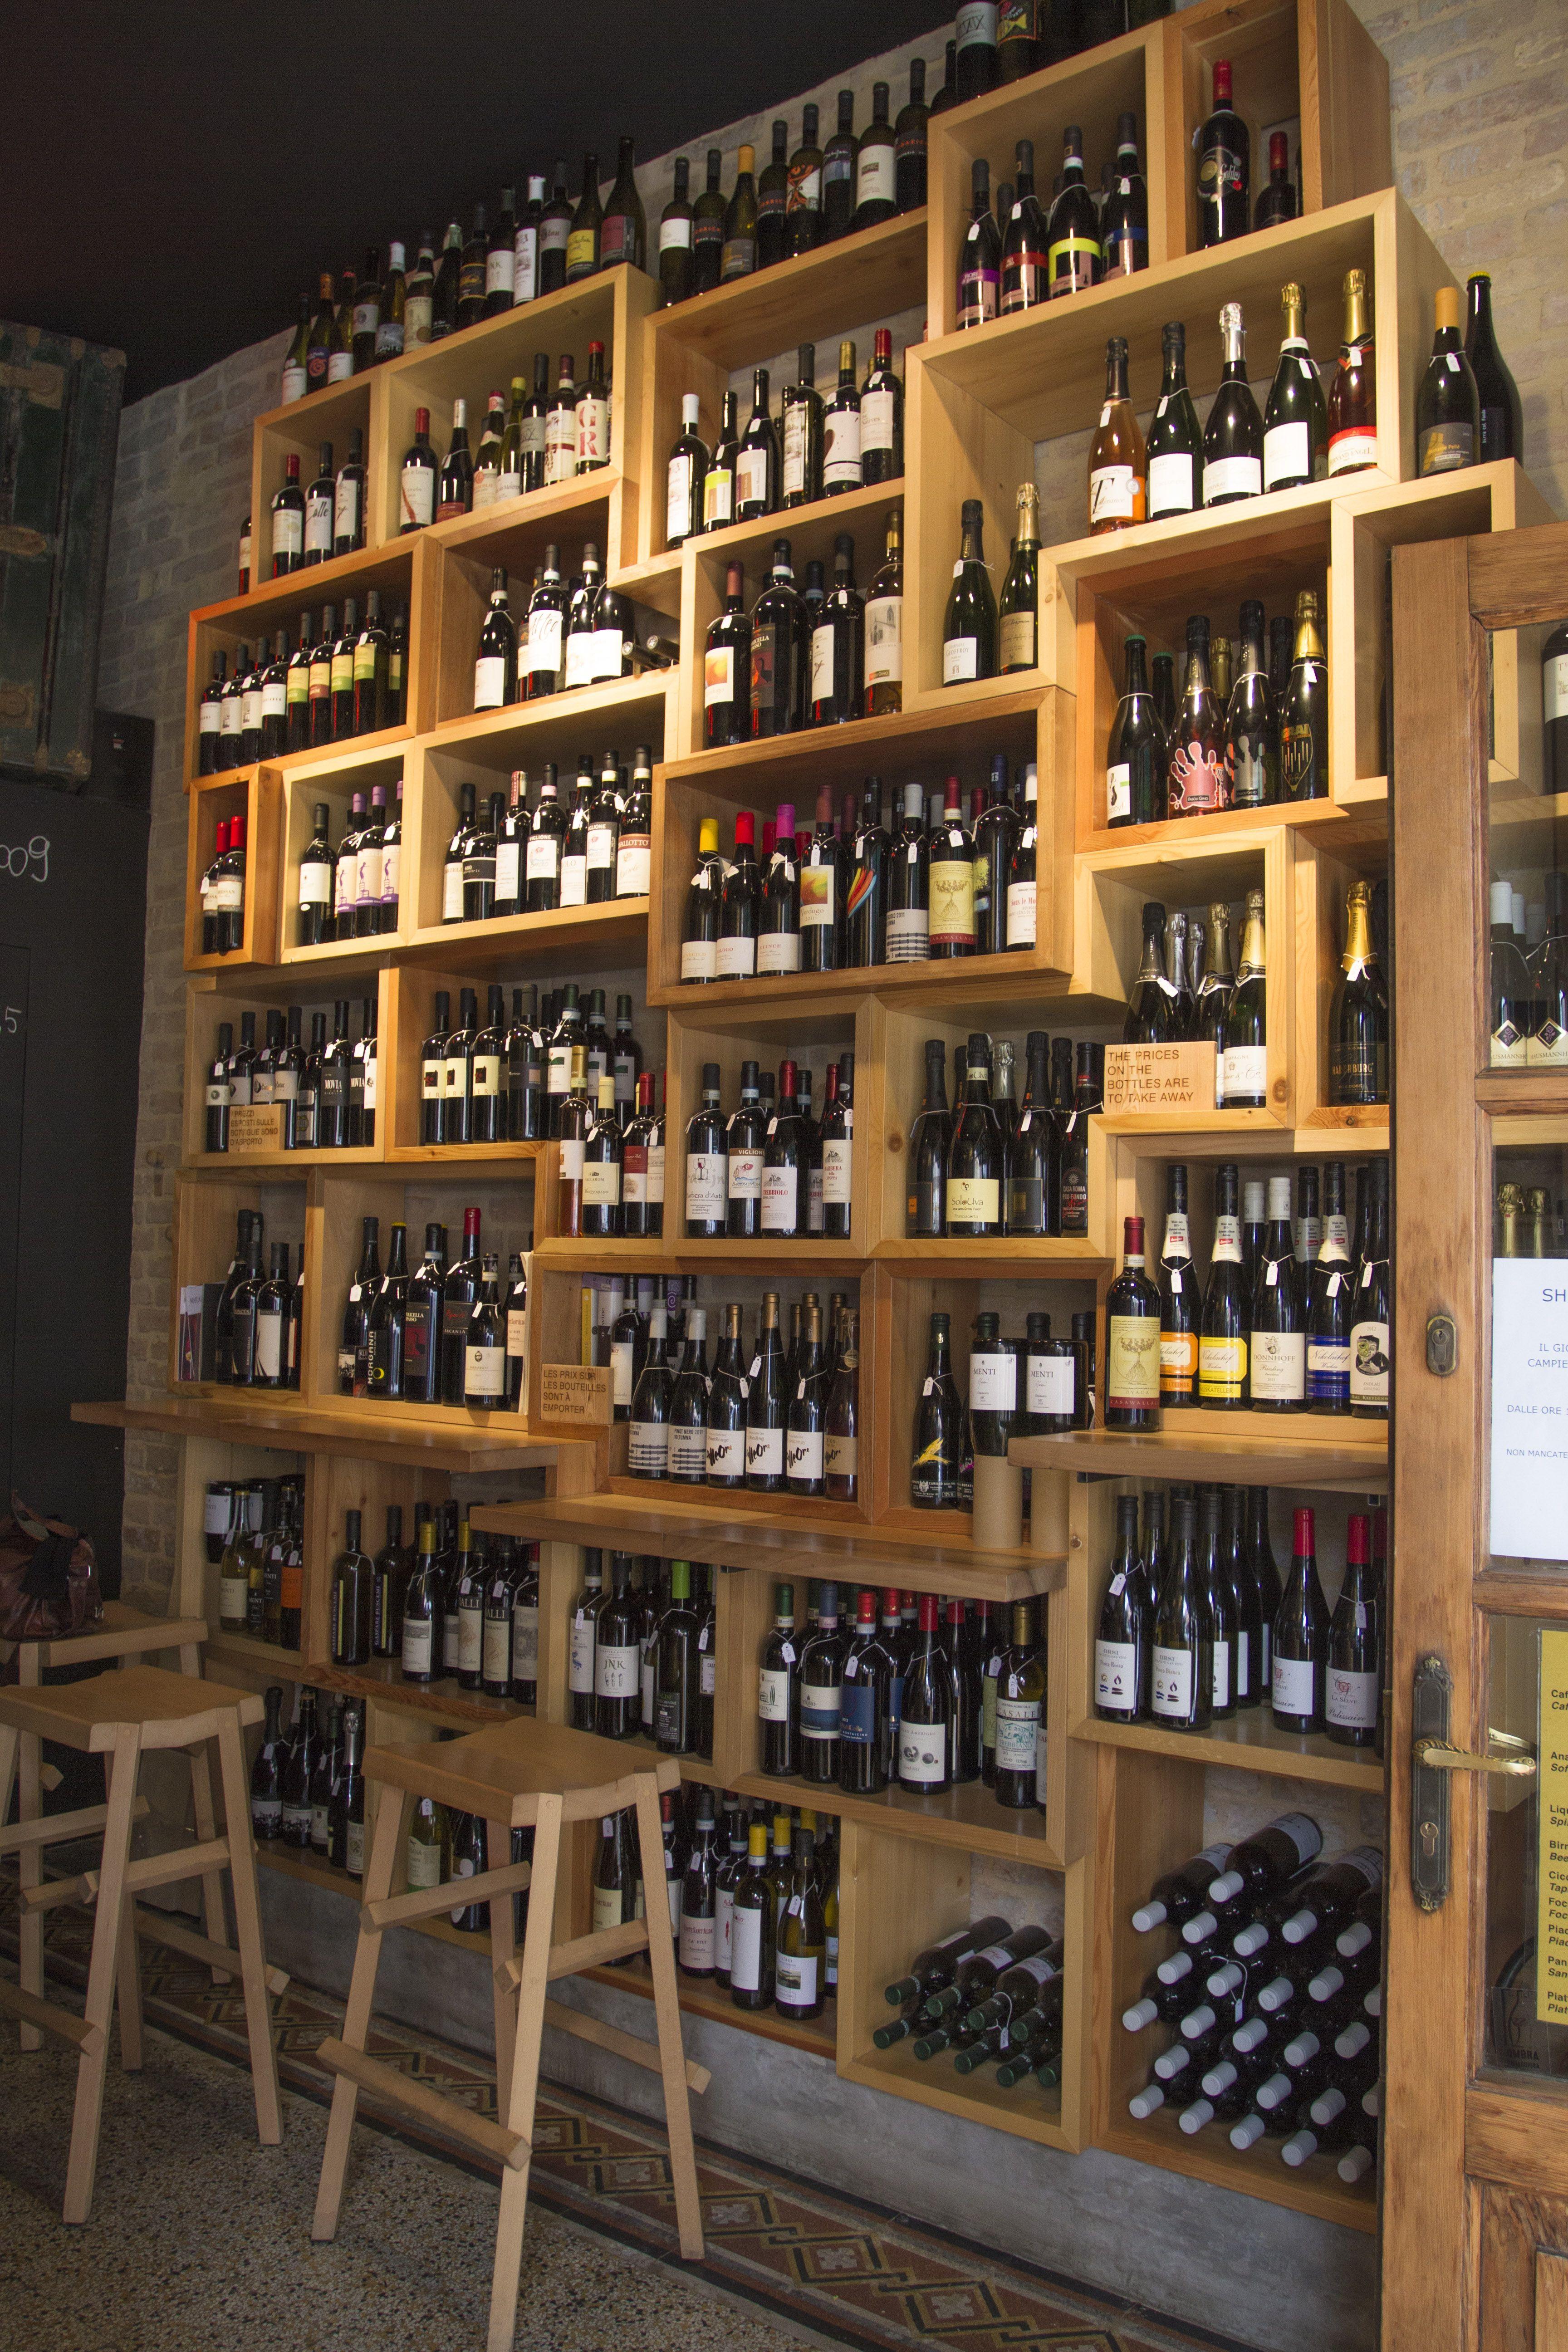 Pin Scaffali Asti.Pin By Leonardo Rueda On Bar In 2019 Wine Shop Interior